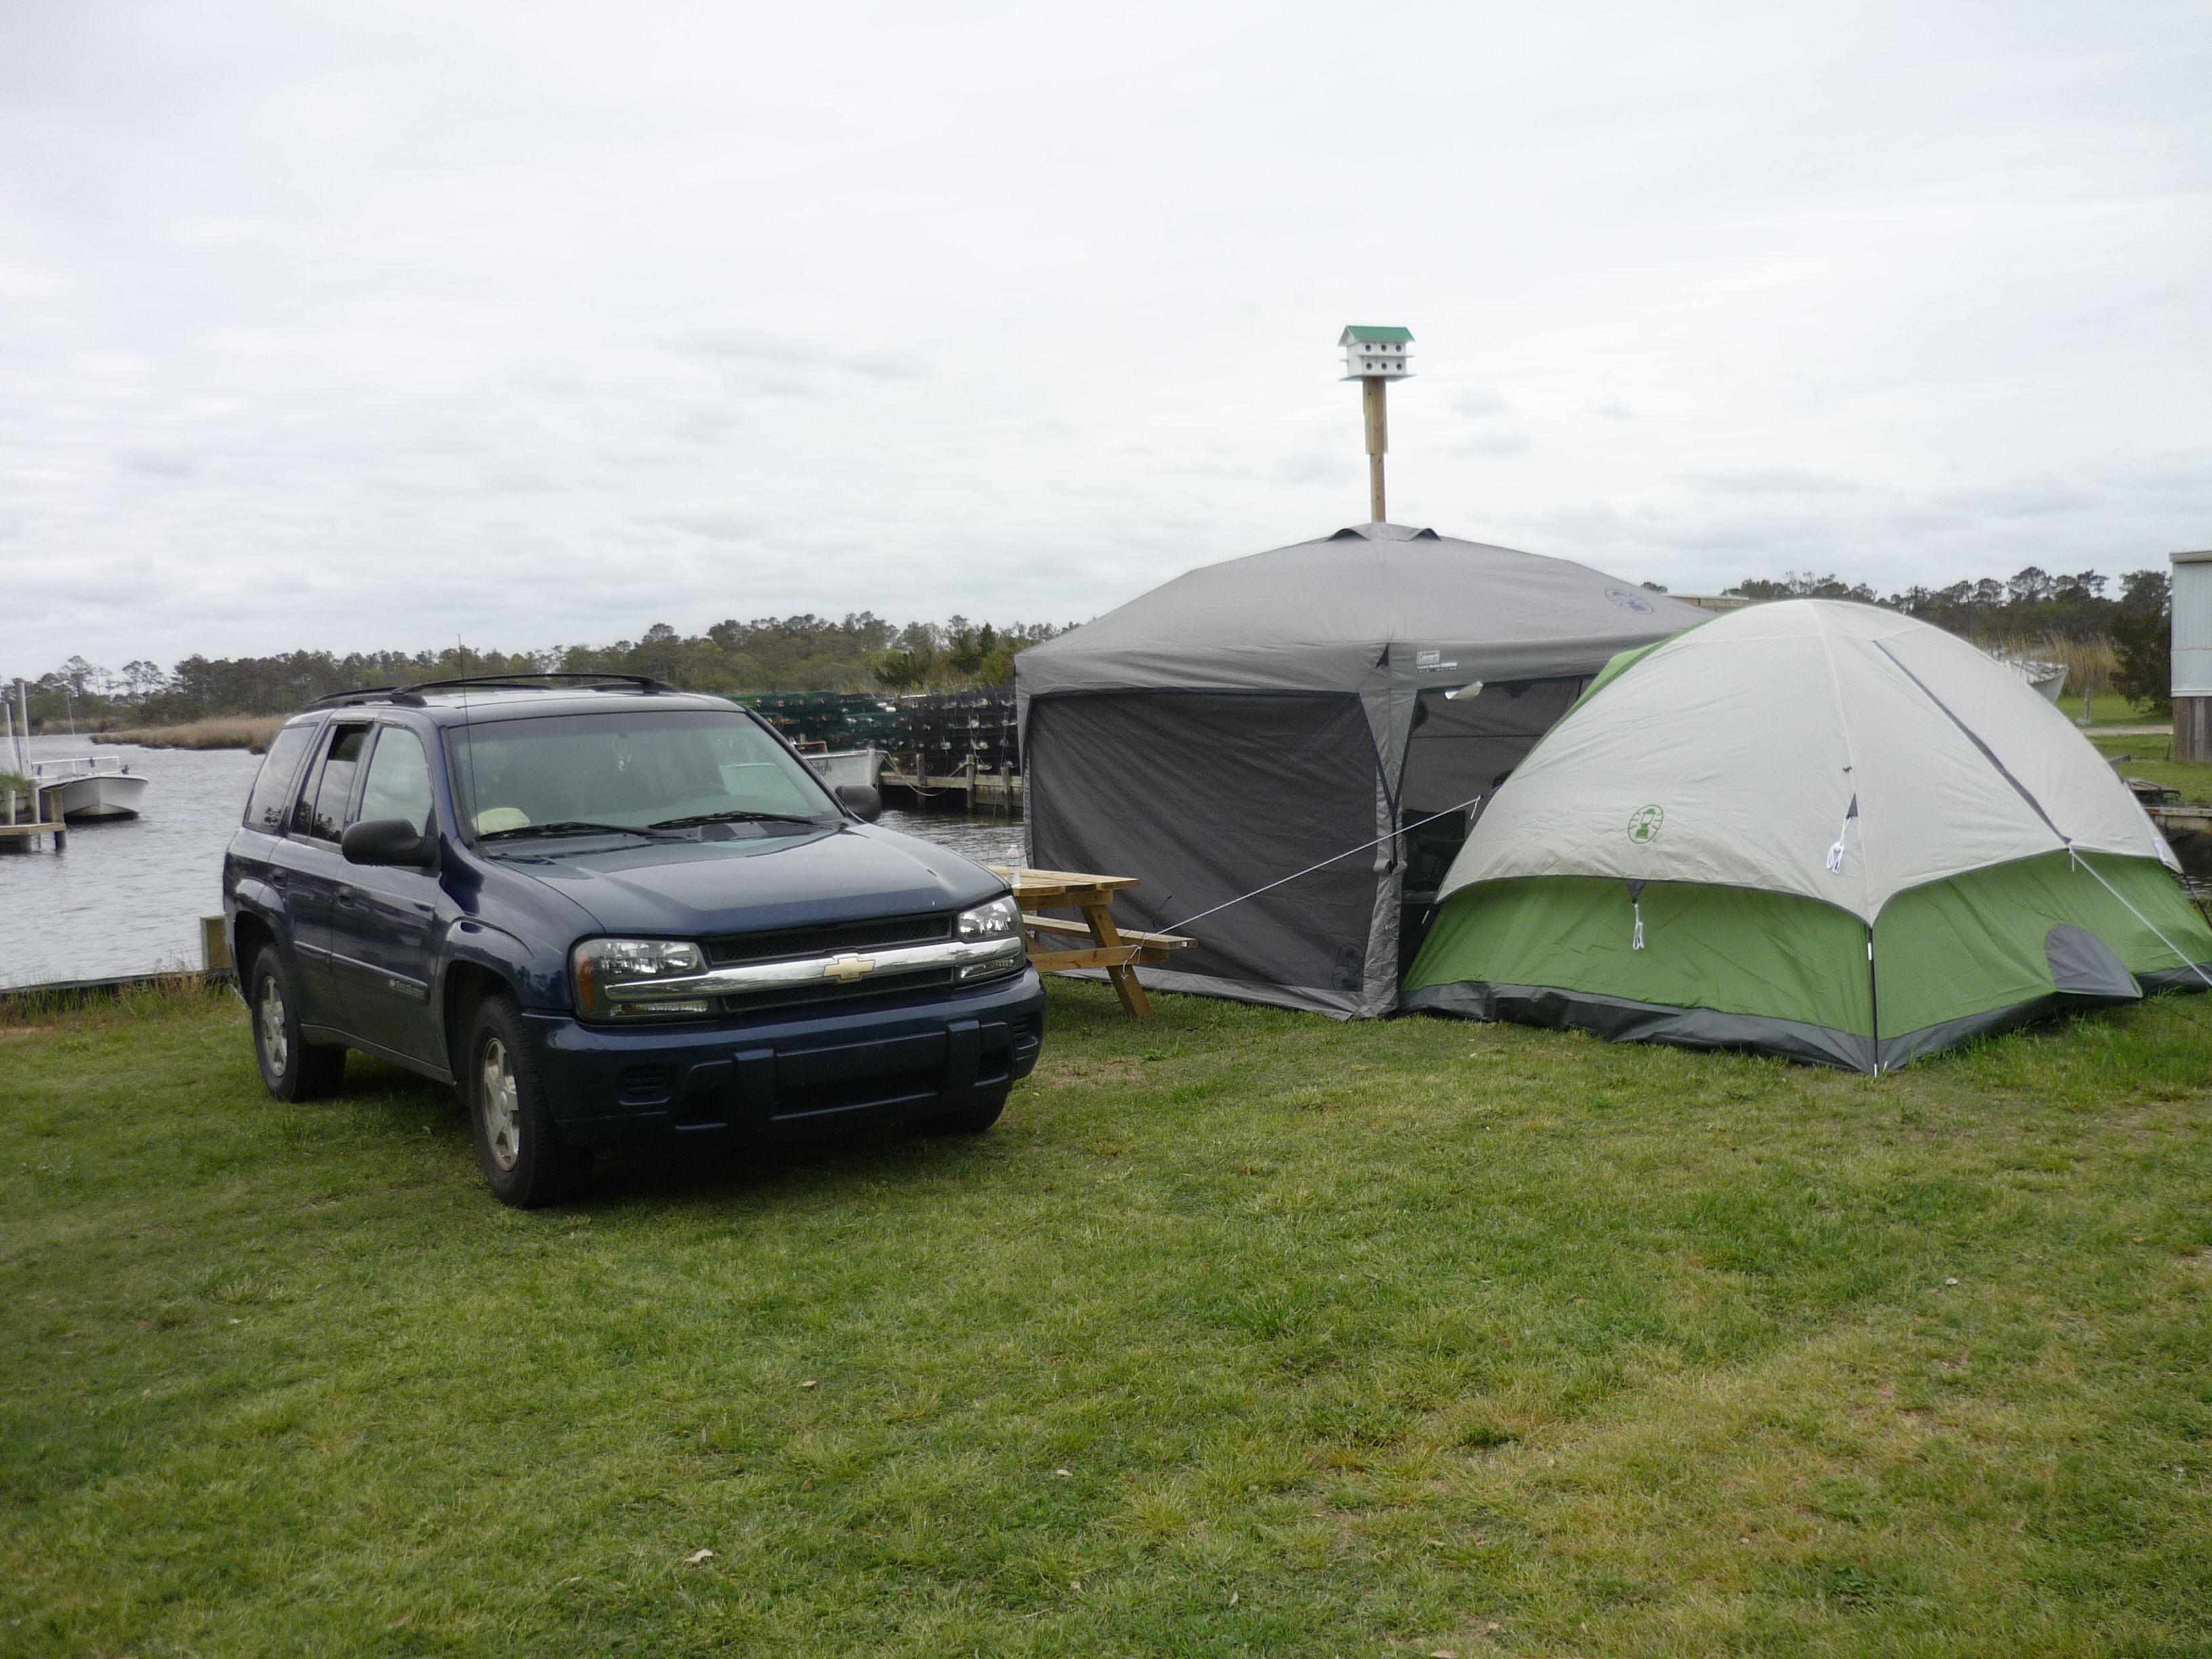 Joe and Kay's Campground on the Inter-Coastal Waterway ...